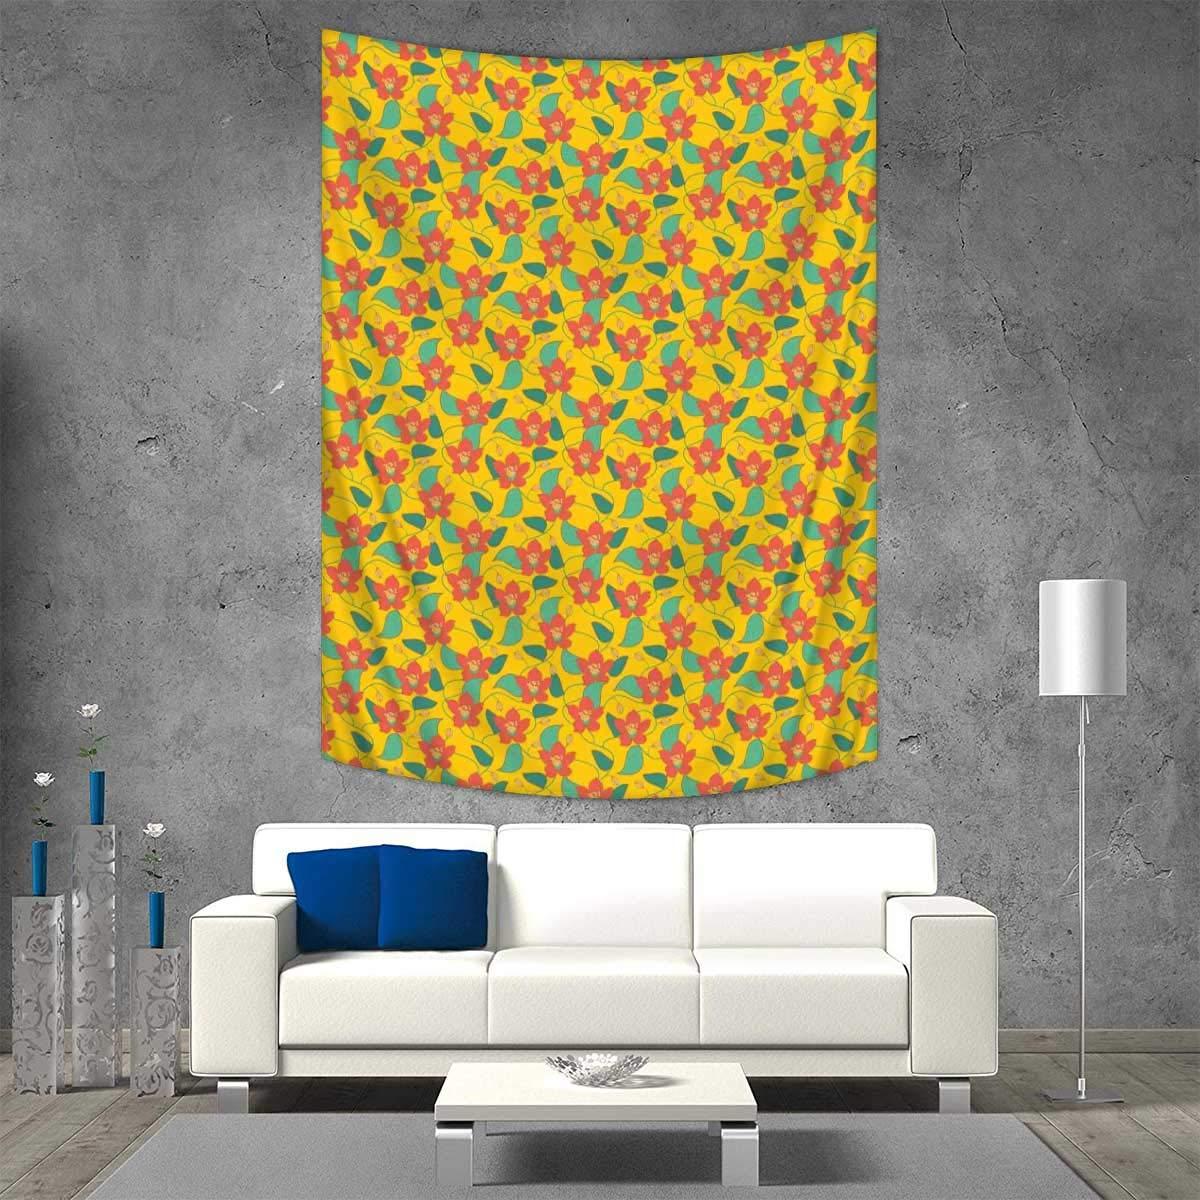 Amazon.com: Anhuthree Floral Art Wall Decor Flowering Meadow Retro ...